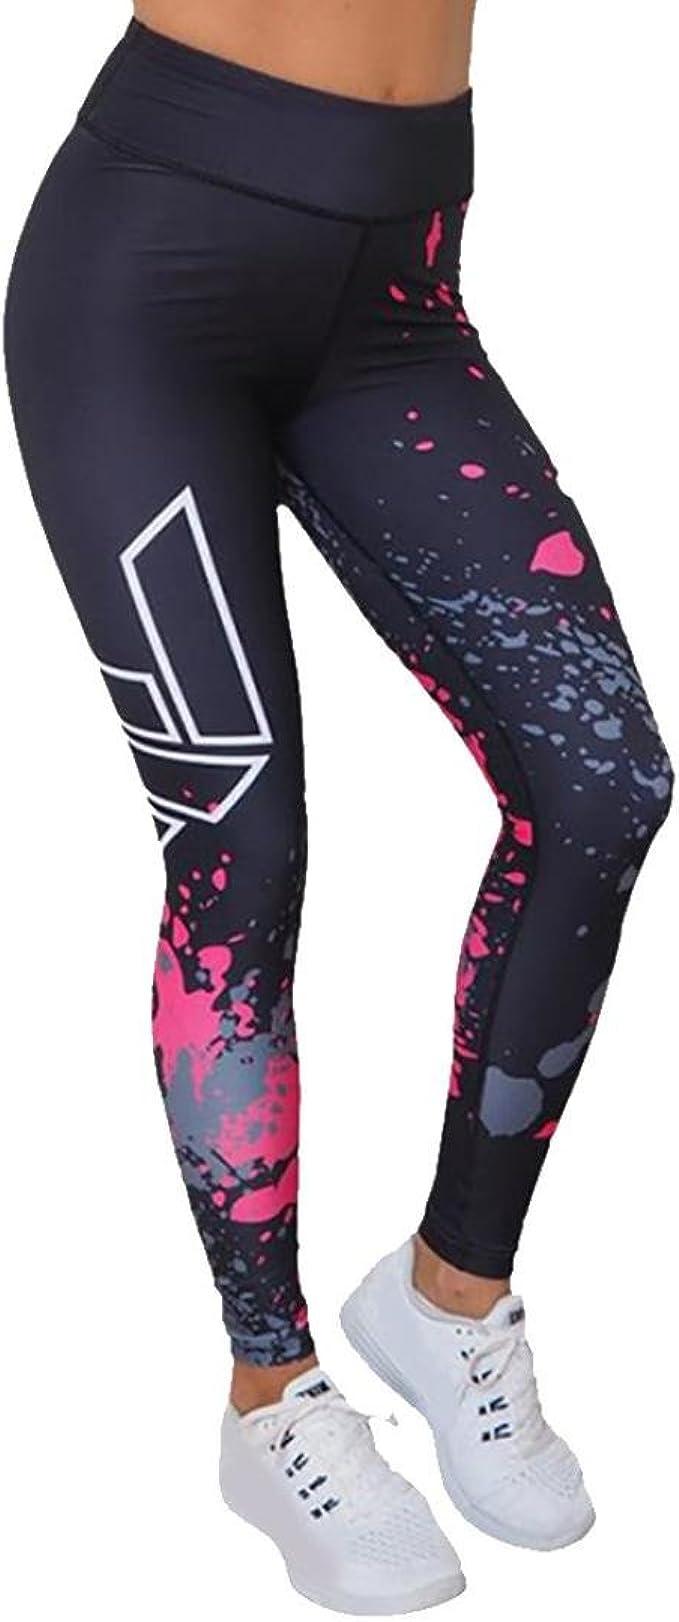 Womens Leggings,Mikey Store Workout Printed Leggings Yoga Power Flex Yoga Pant